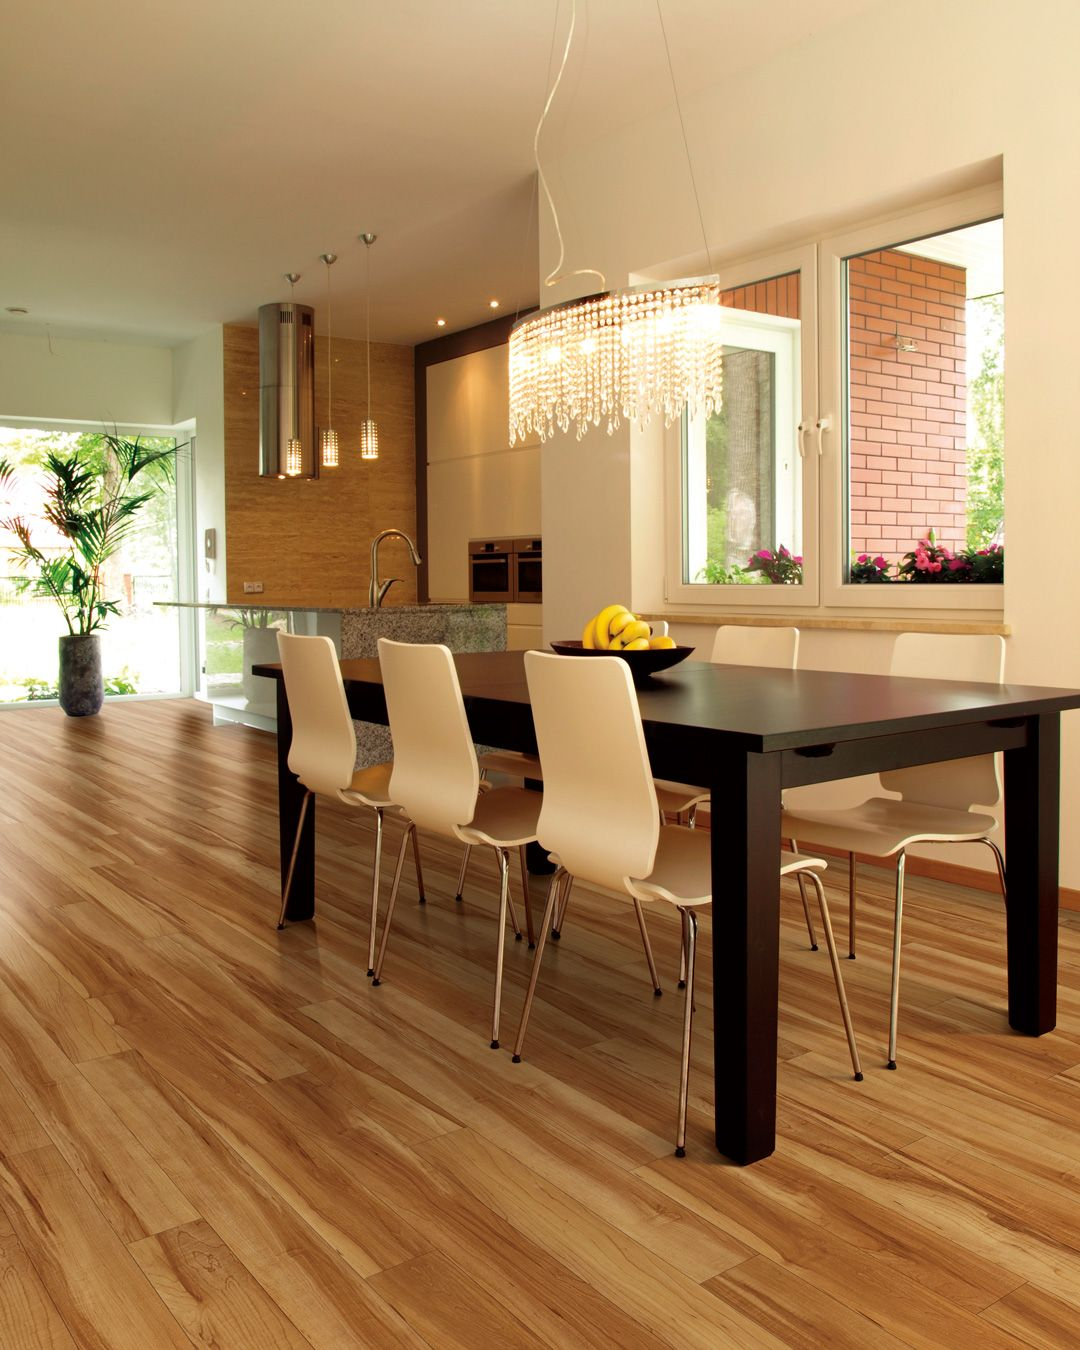 Coretec 5 Red River Hickory 50lvp508 Wood Floor Dining Room Waterproof Laminate Flooring Vinyl Plank Flooring